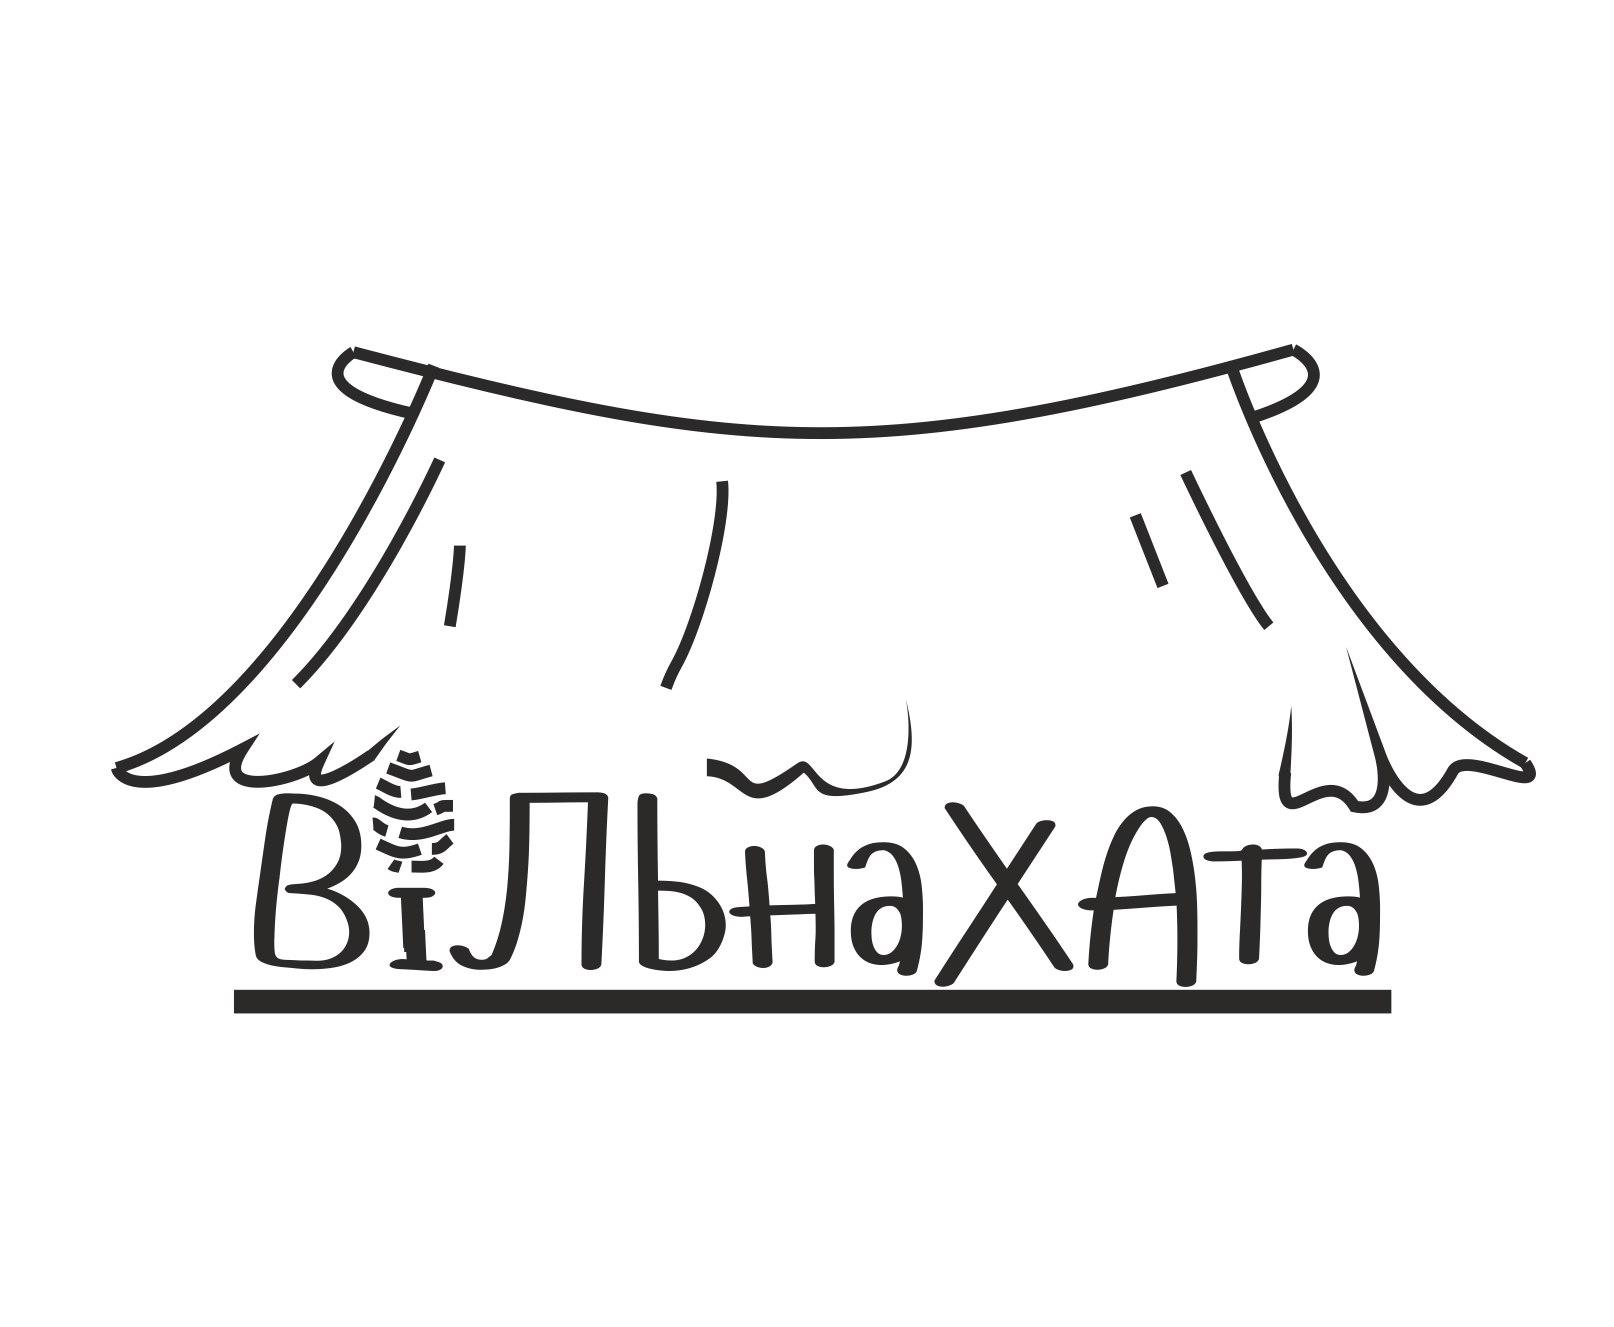 Картинки по запросу вільна хата лого